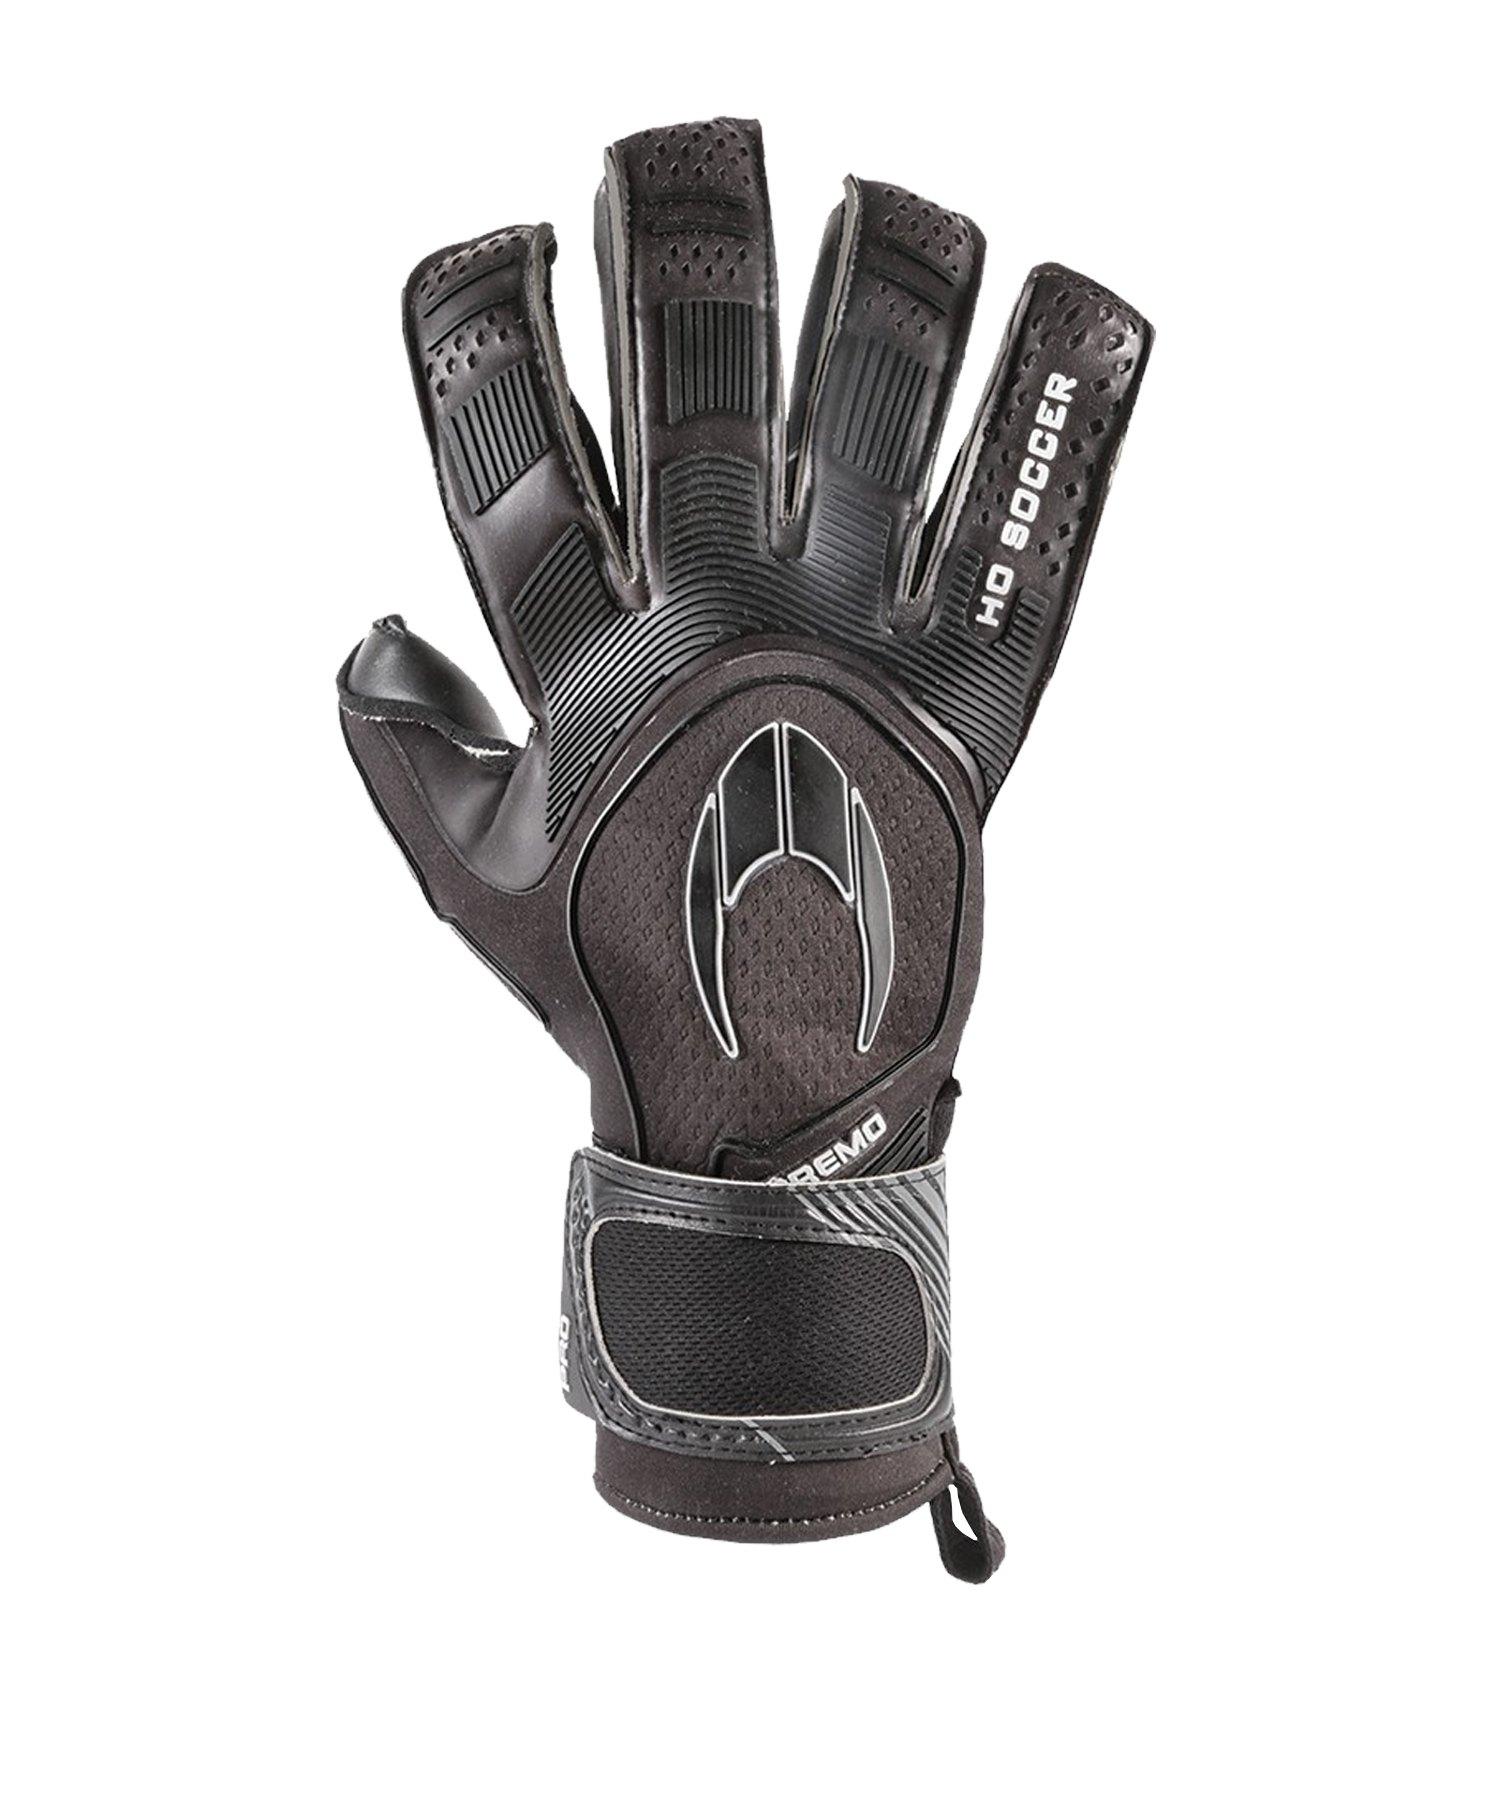 HO Soccer Supremo Pro 2 Roll TW-Handschuhe Schwarz - schwarz